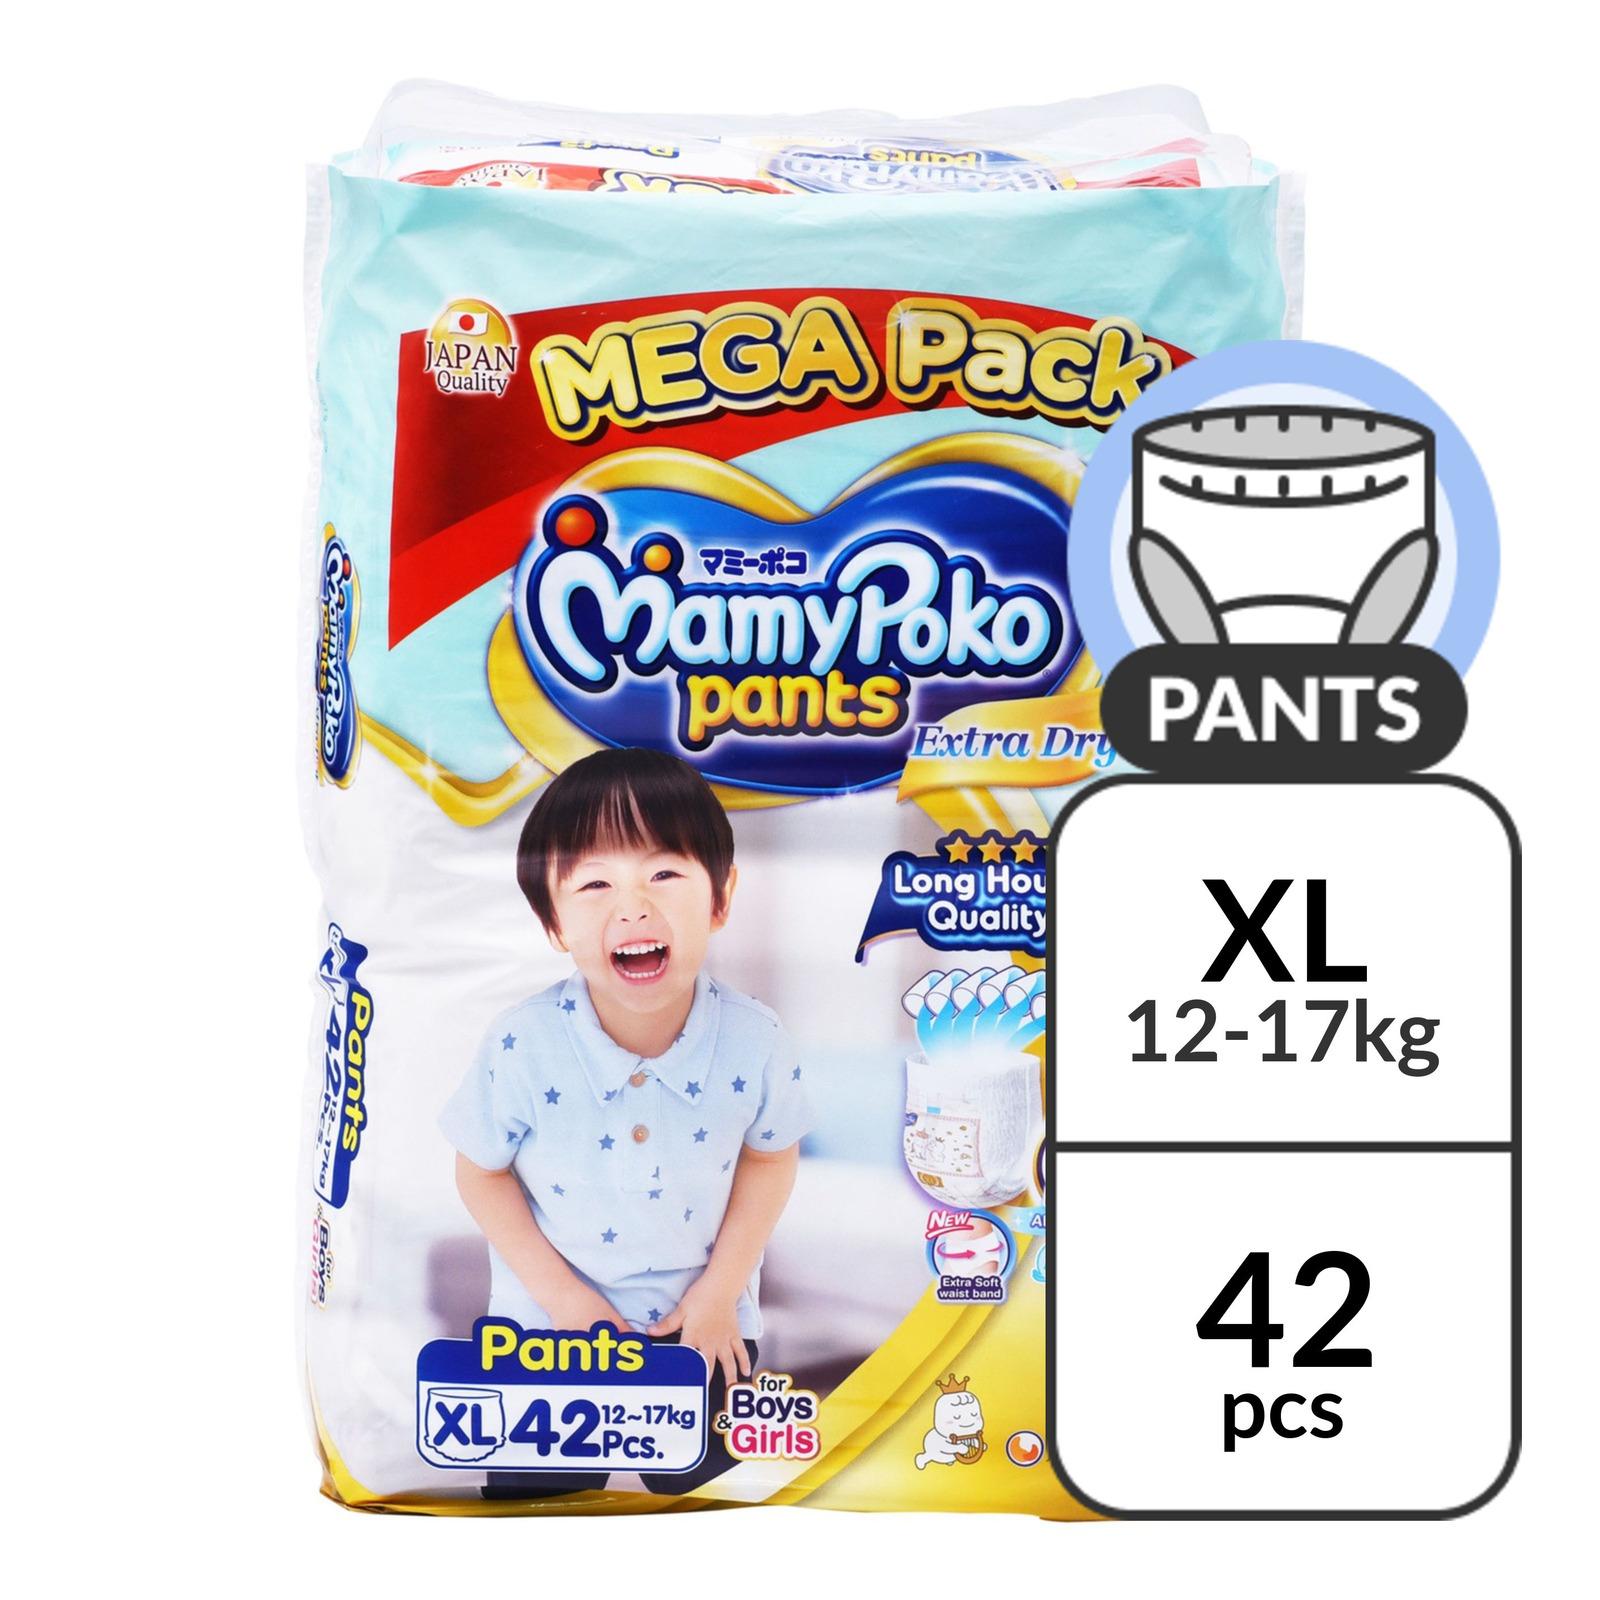 MamyPoko Extra Dry Skin Unisex Pants - XL (12-17kg)